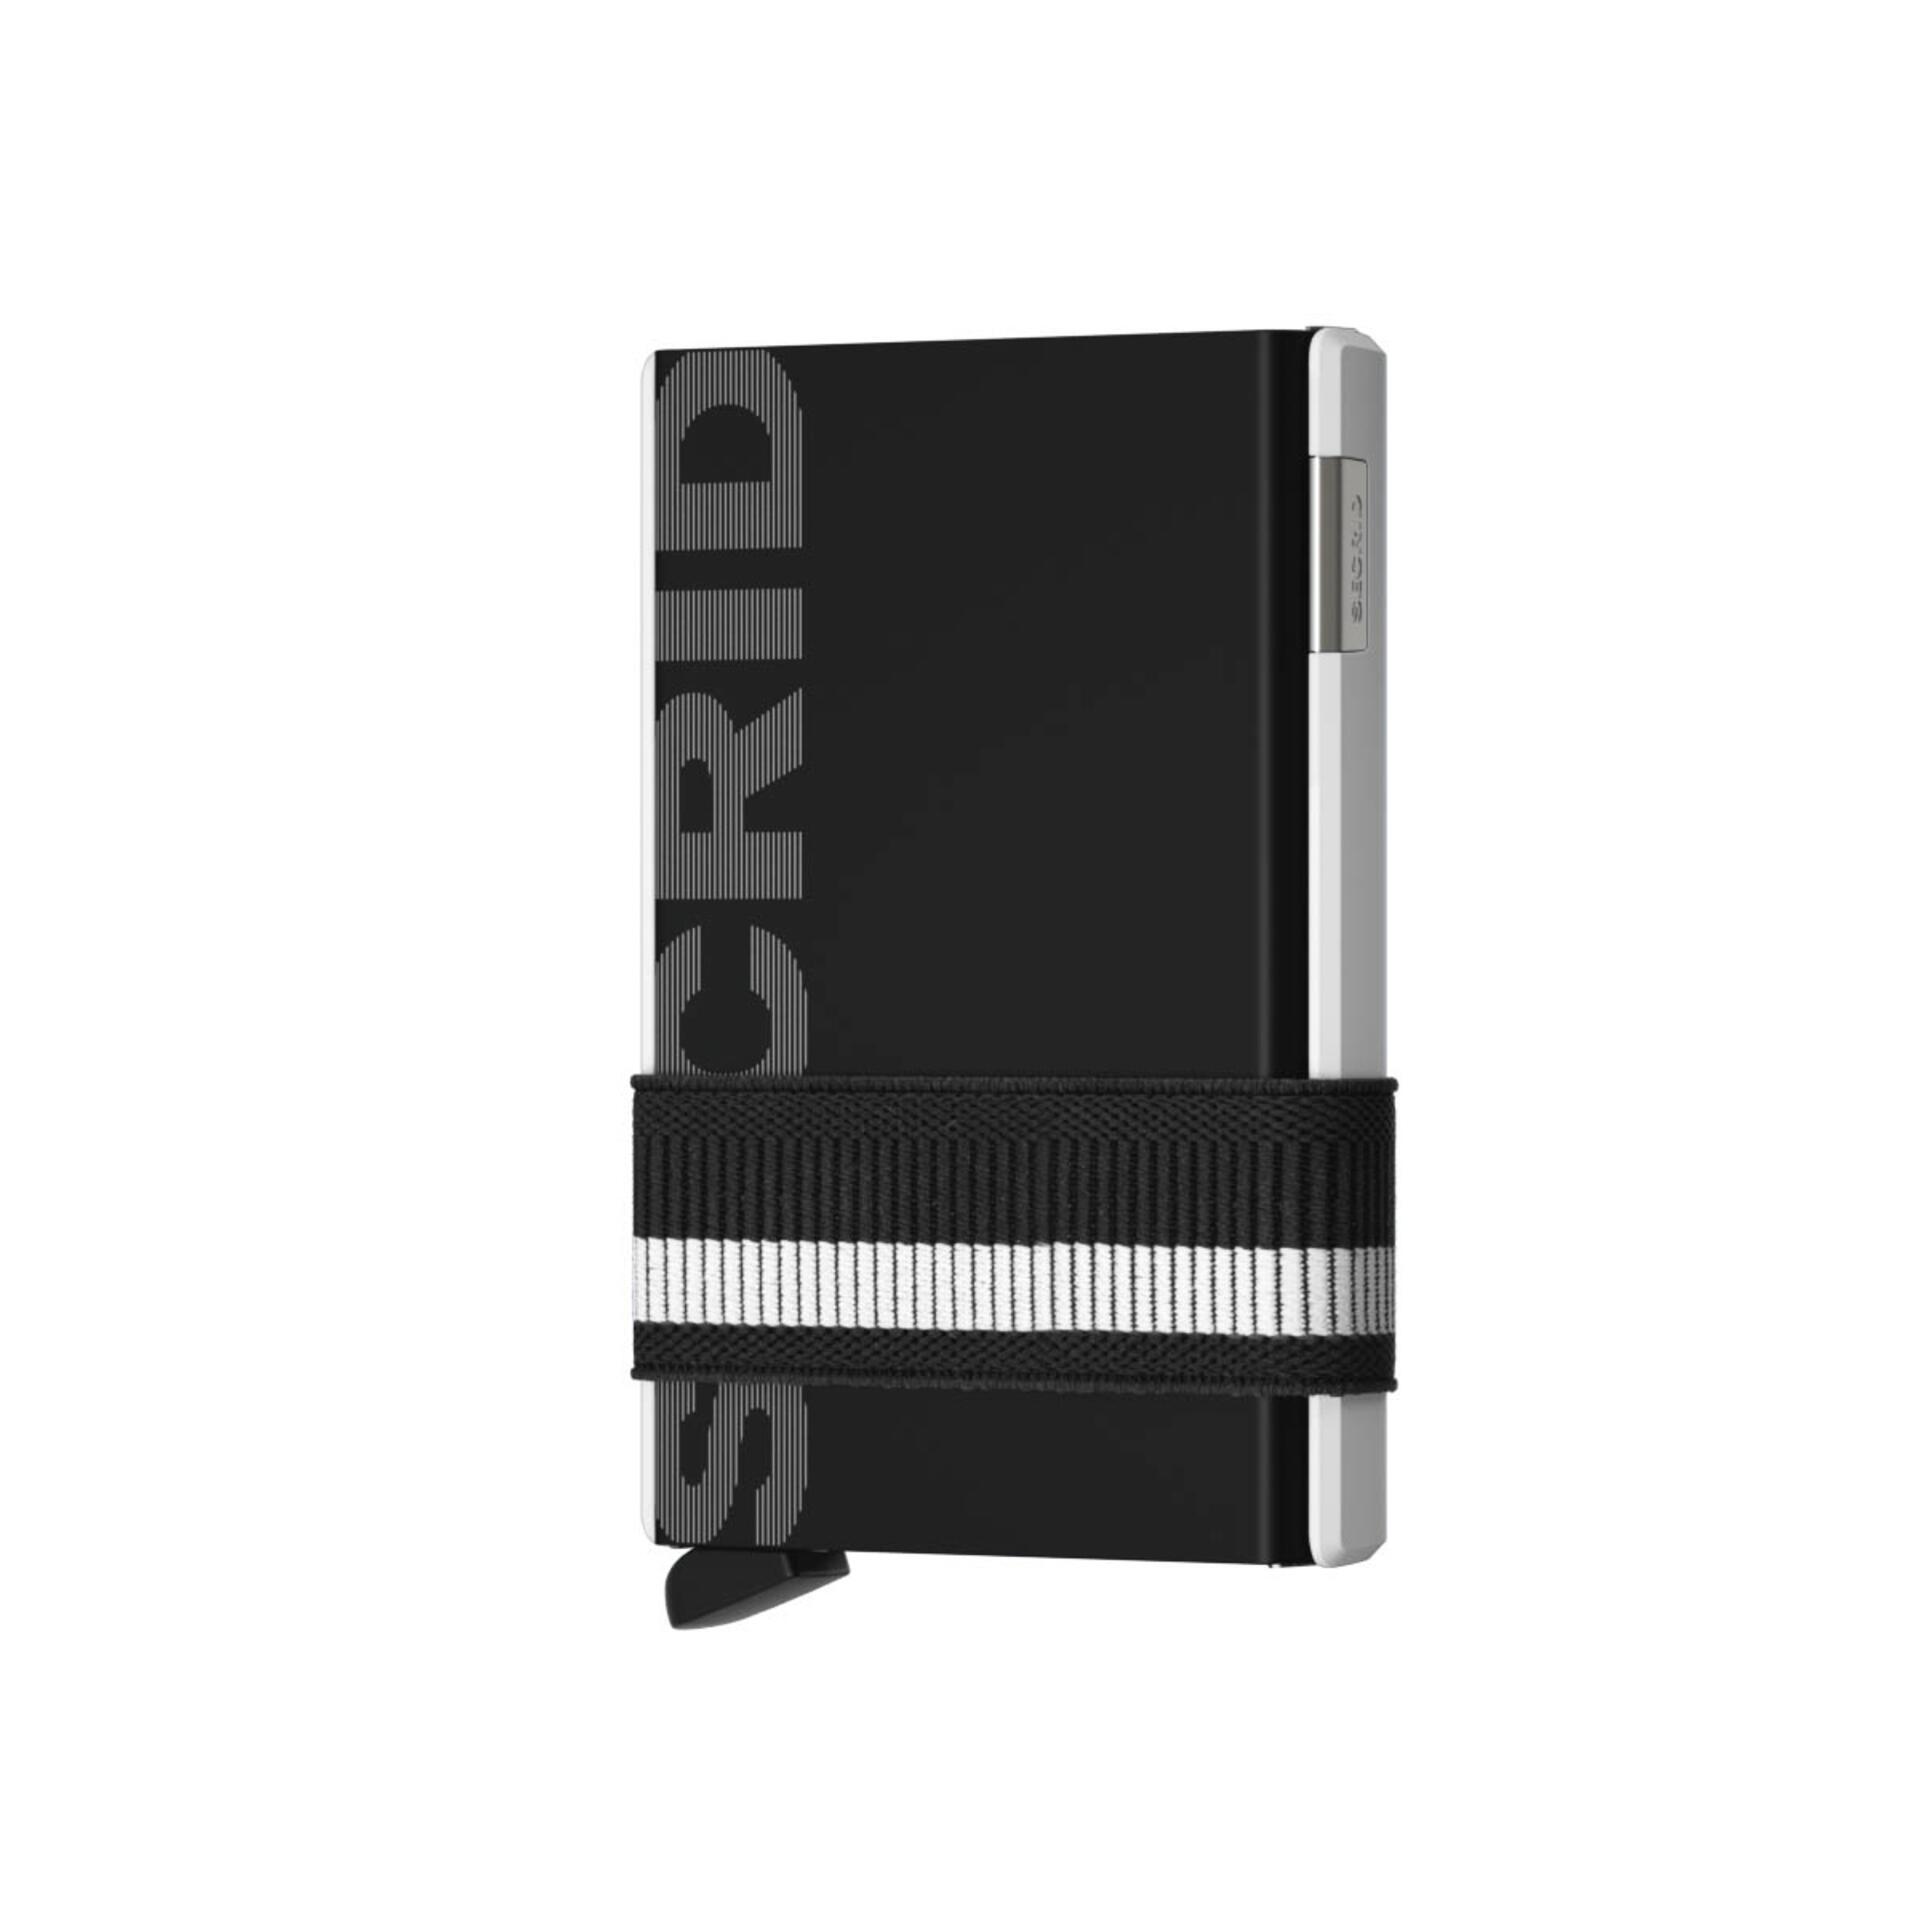 Secrid Cardslide Monochrome